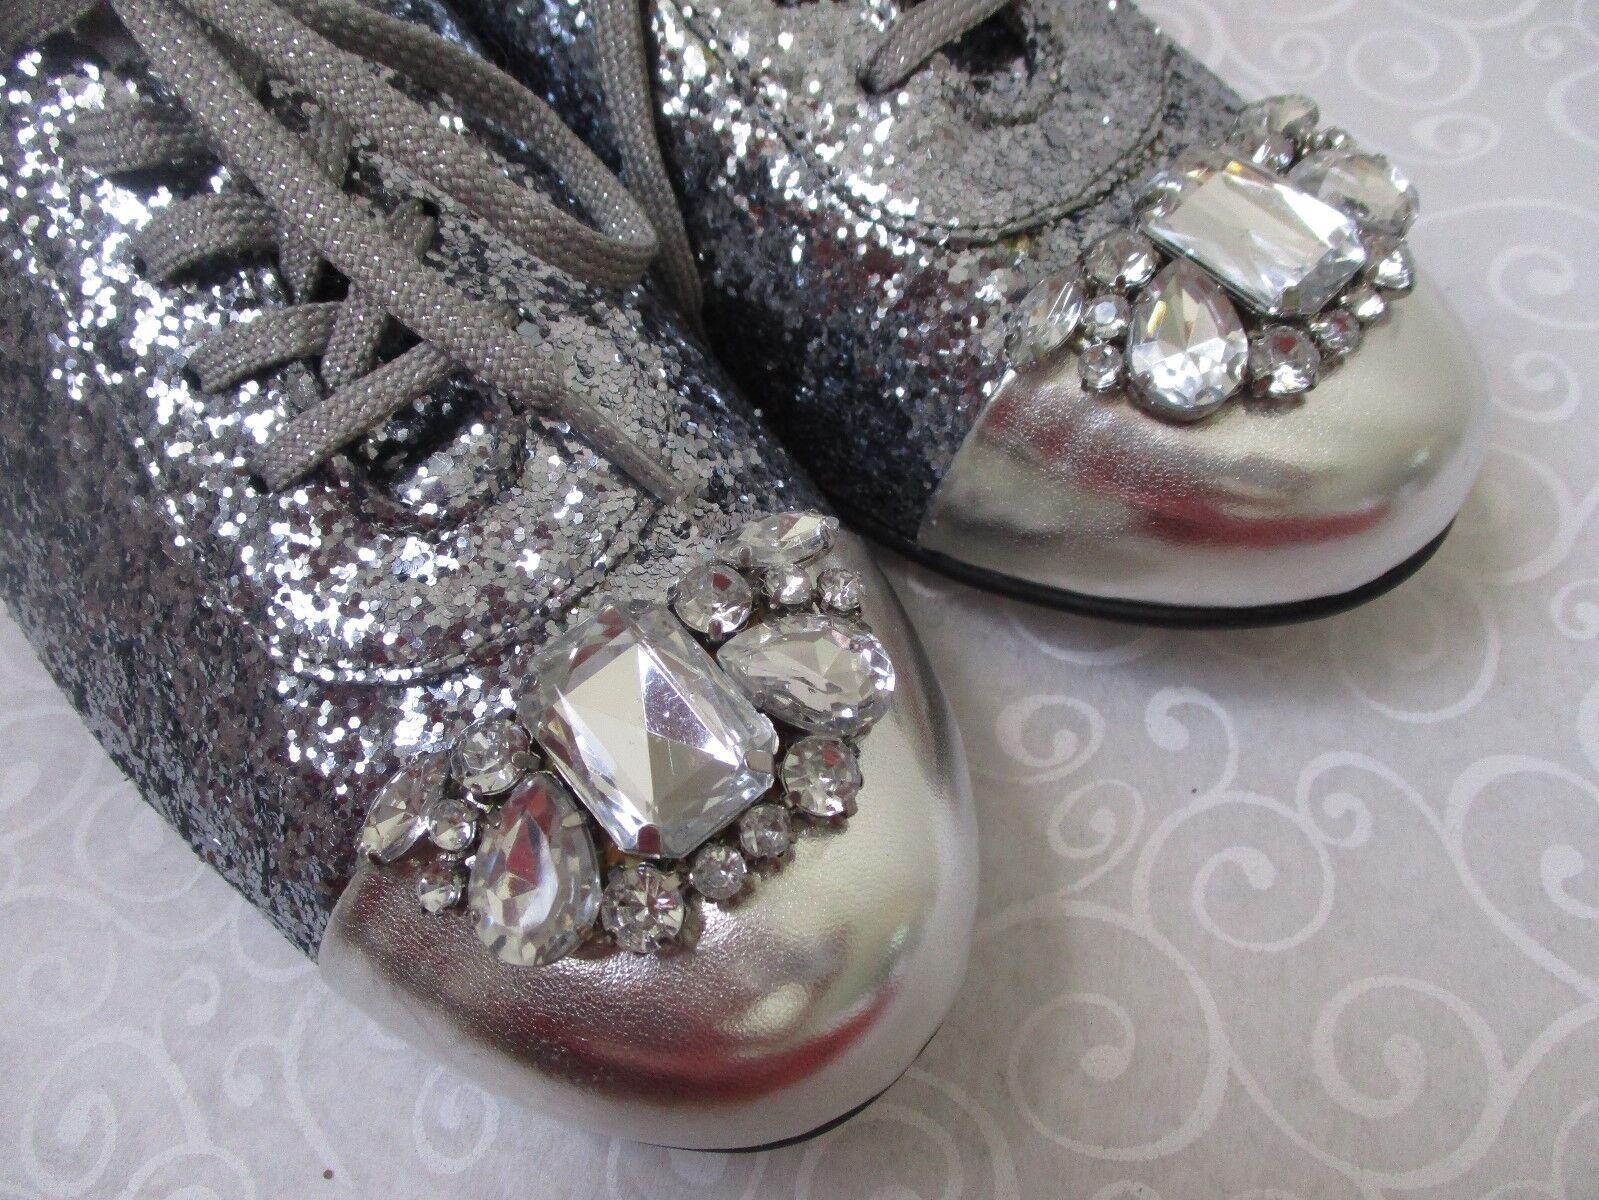 JOAN BOYCE DENISE PEWTER GLITTER & SILVER JEWELED FLATS Schuhe Schuhe Schuhe SIZE 8 W - NEW 3a82f0